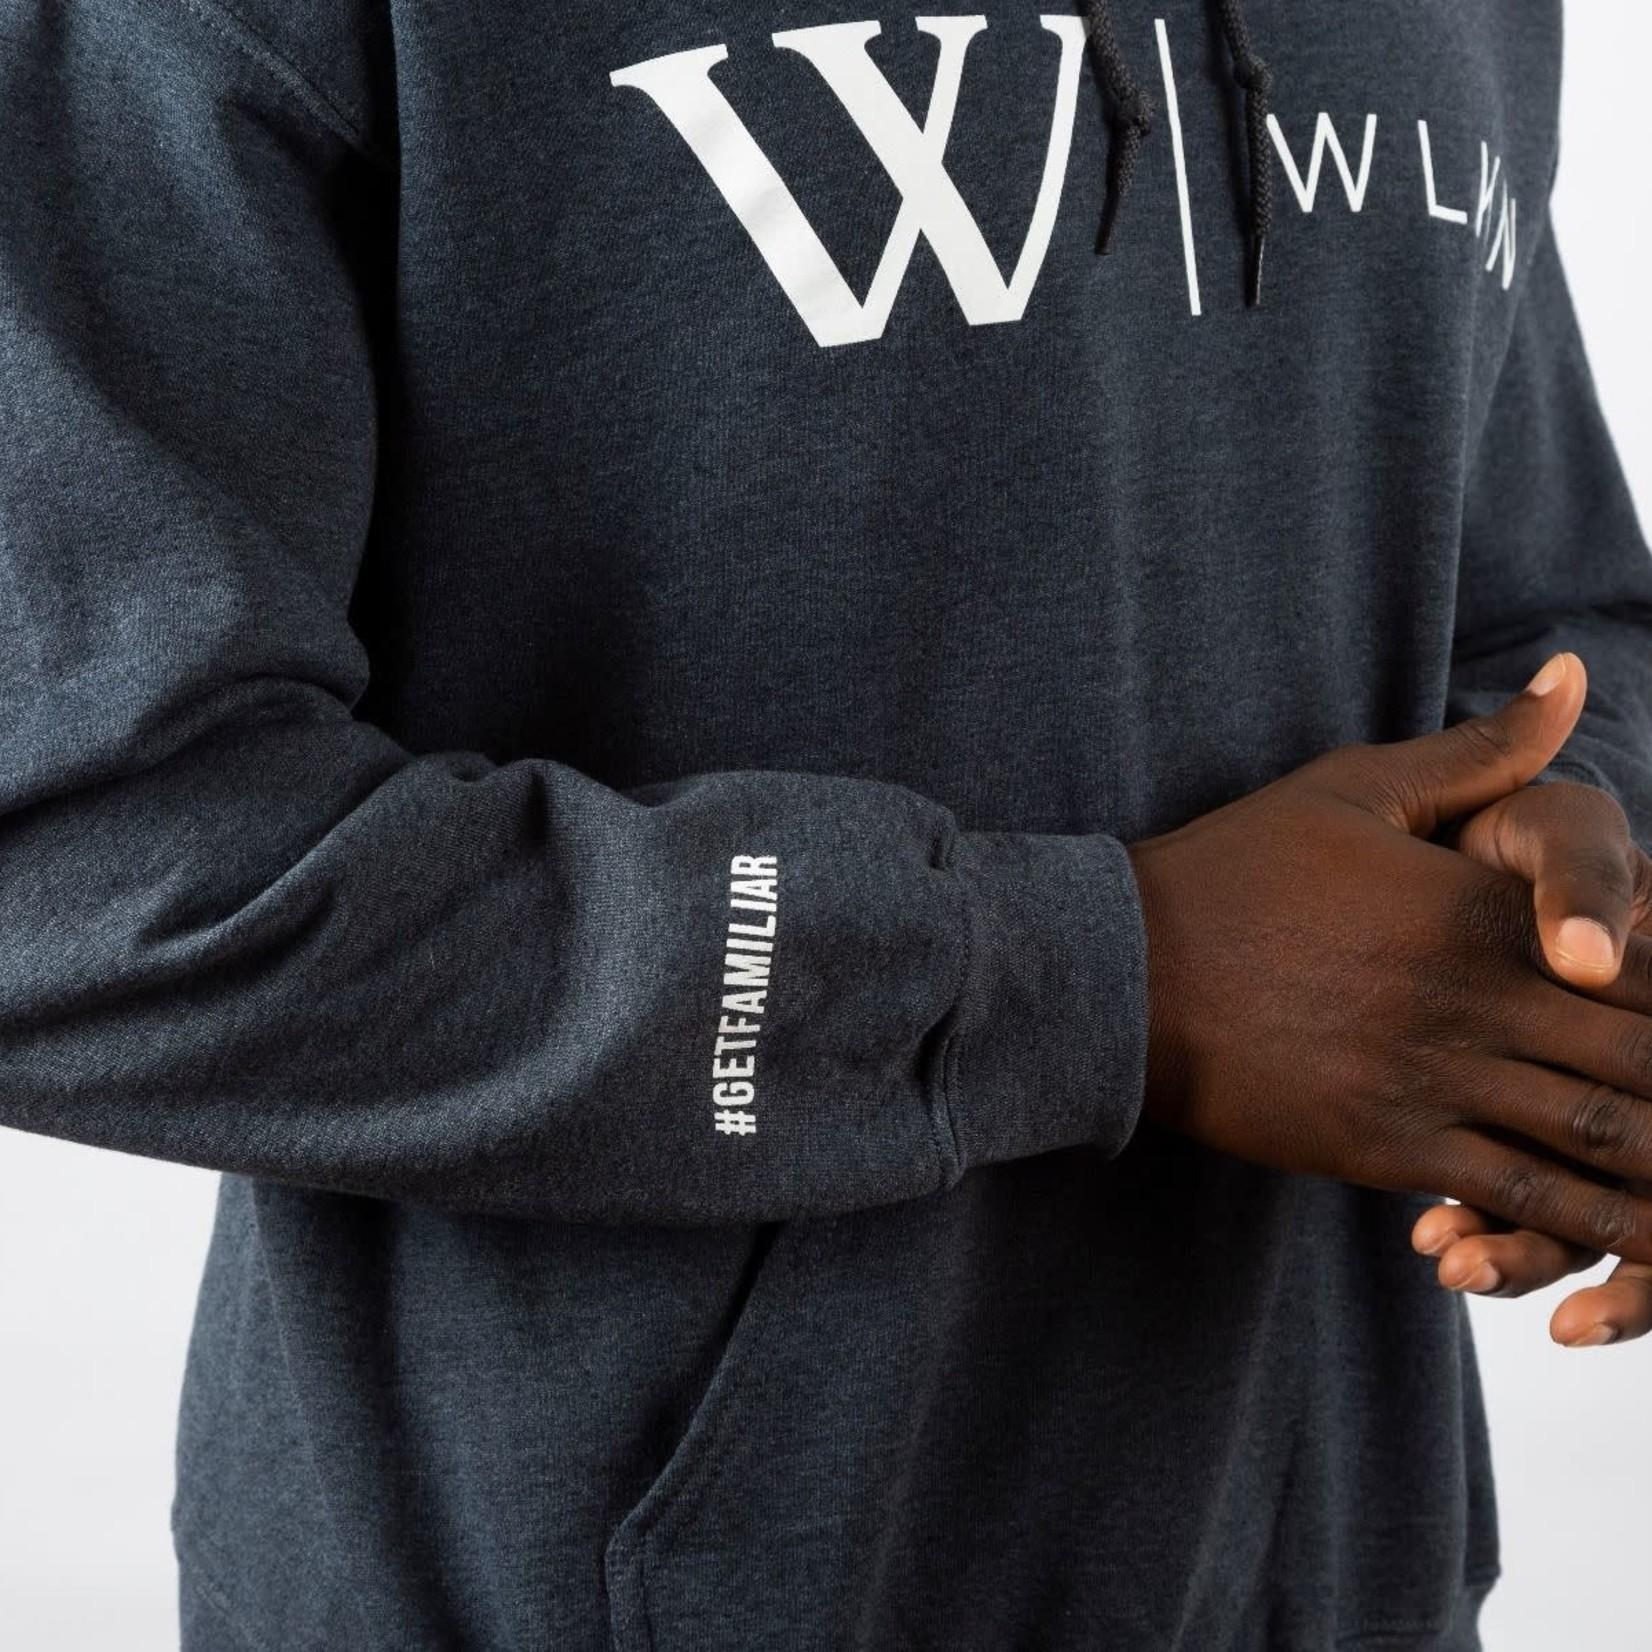 WLKN WLKN : The Building Signature Logo Hoodie